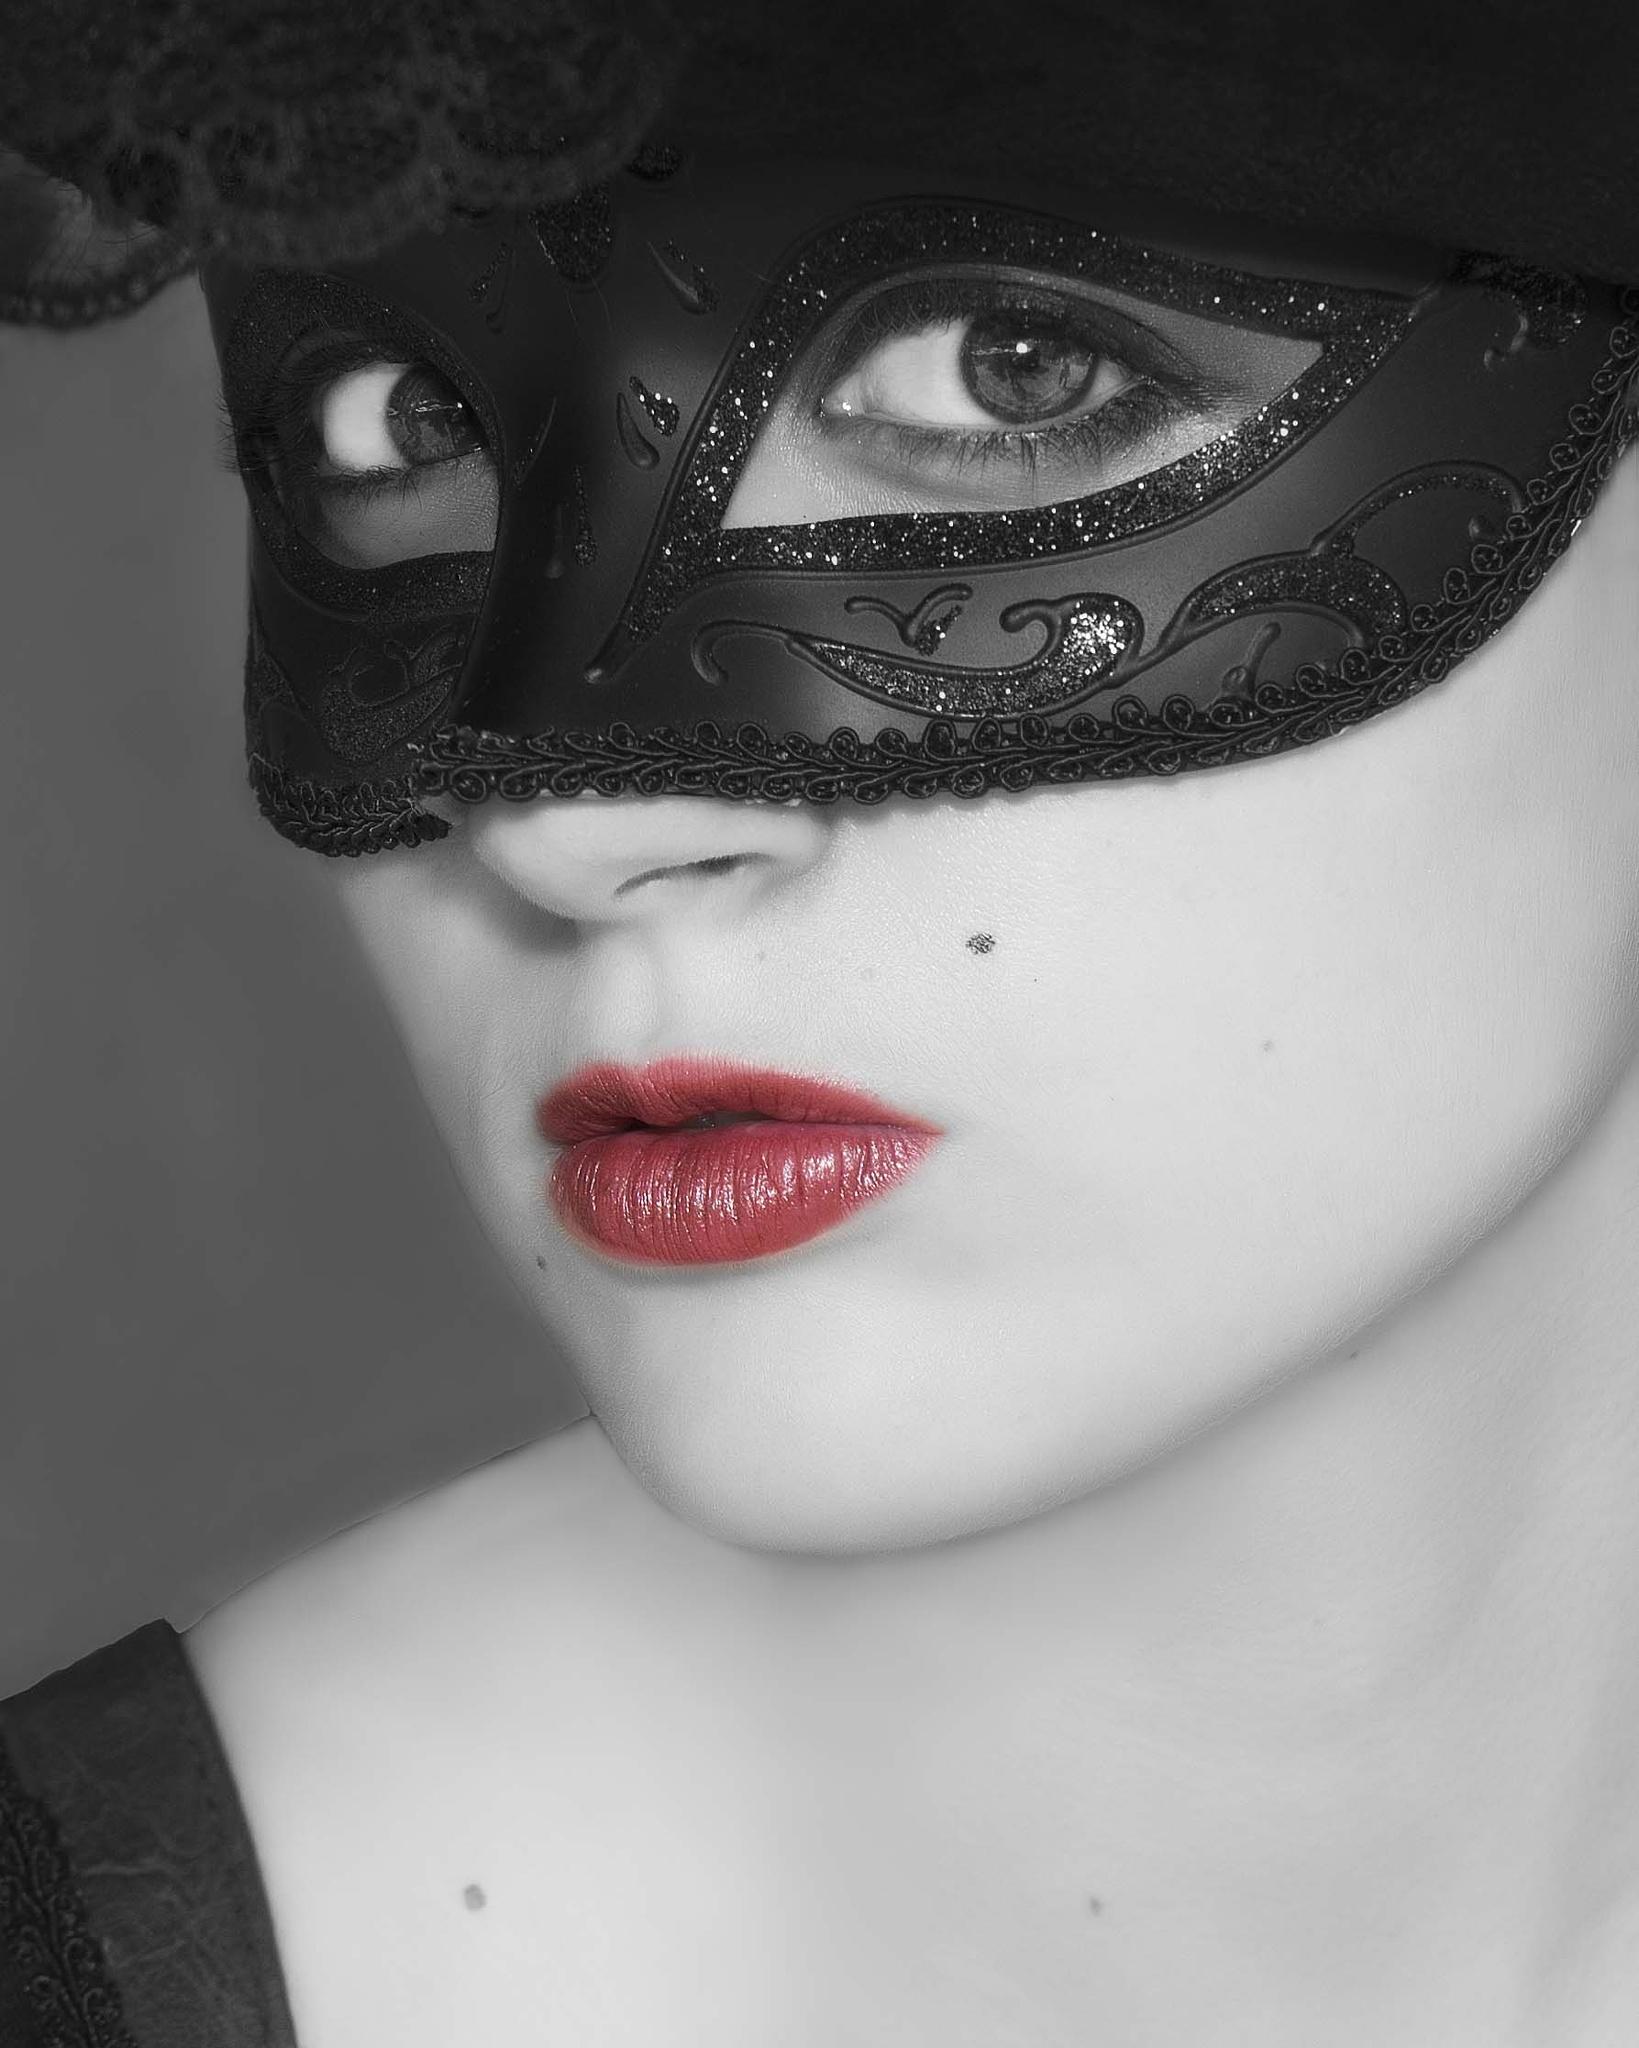 Masquerade Closeup by Scott Allen